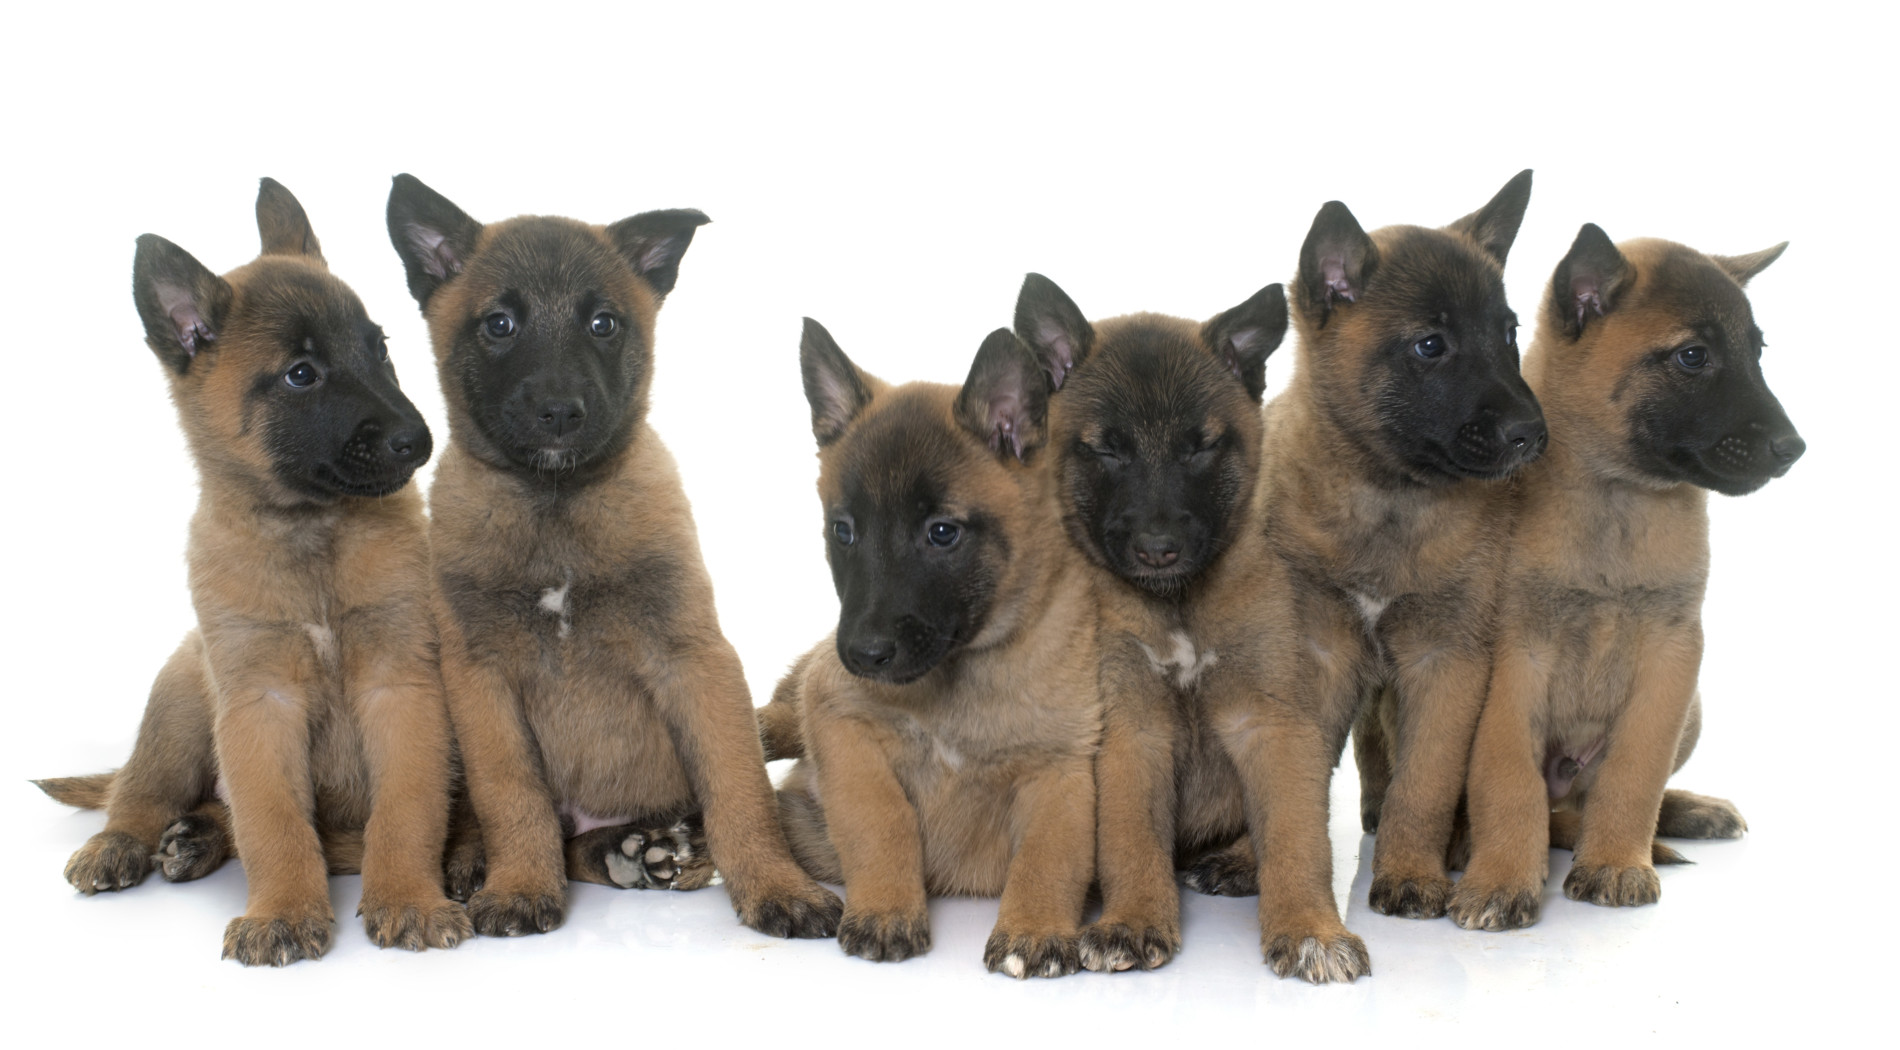 Belgian Malinois puppies - Royal Dog Academy